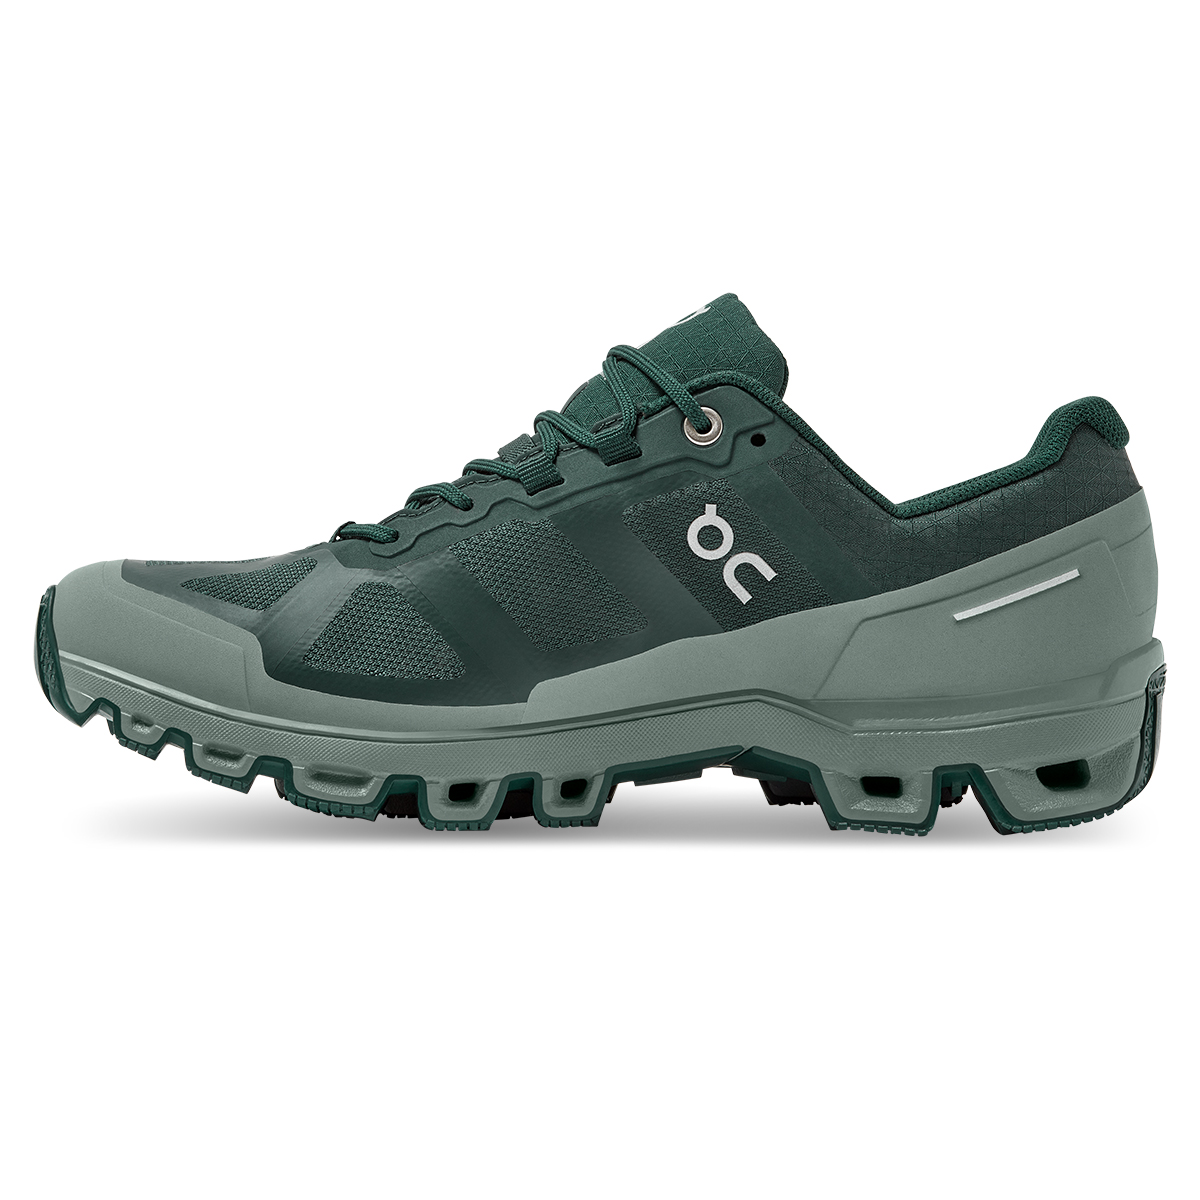 Women's On Cloudventure Waterproof Trail Running Shoe - Color: Juniper/Sea - Size: 5 - Width: Regular, Juniper/Sea, large, image 2